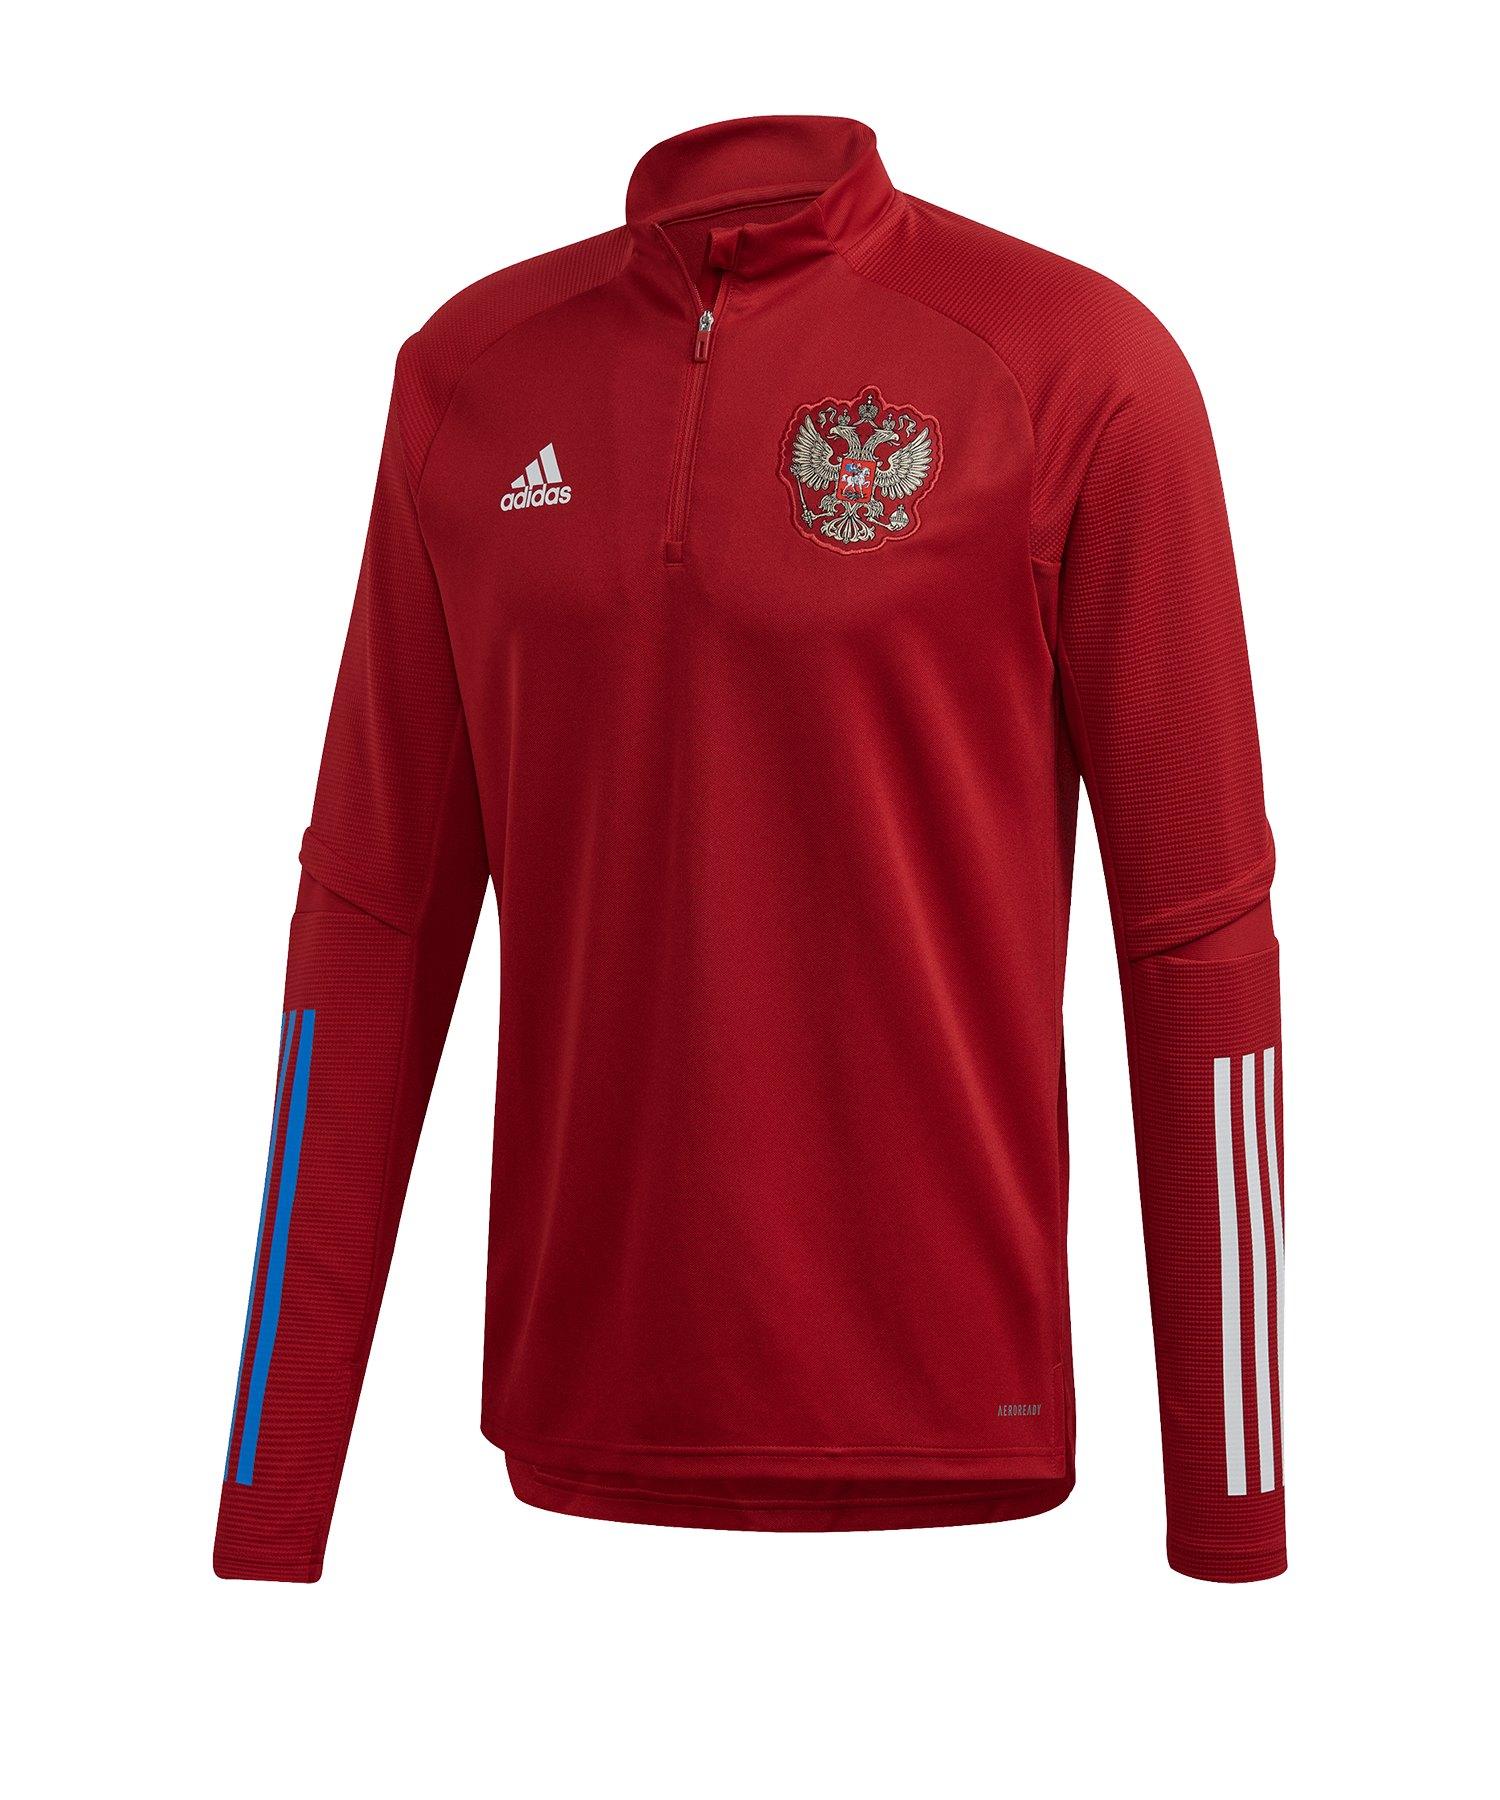 adidas Russland 1/4 Zip Sweatshirt Rot - rot